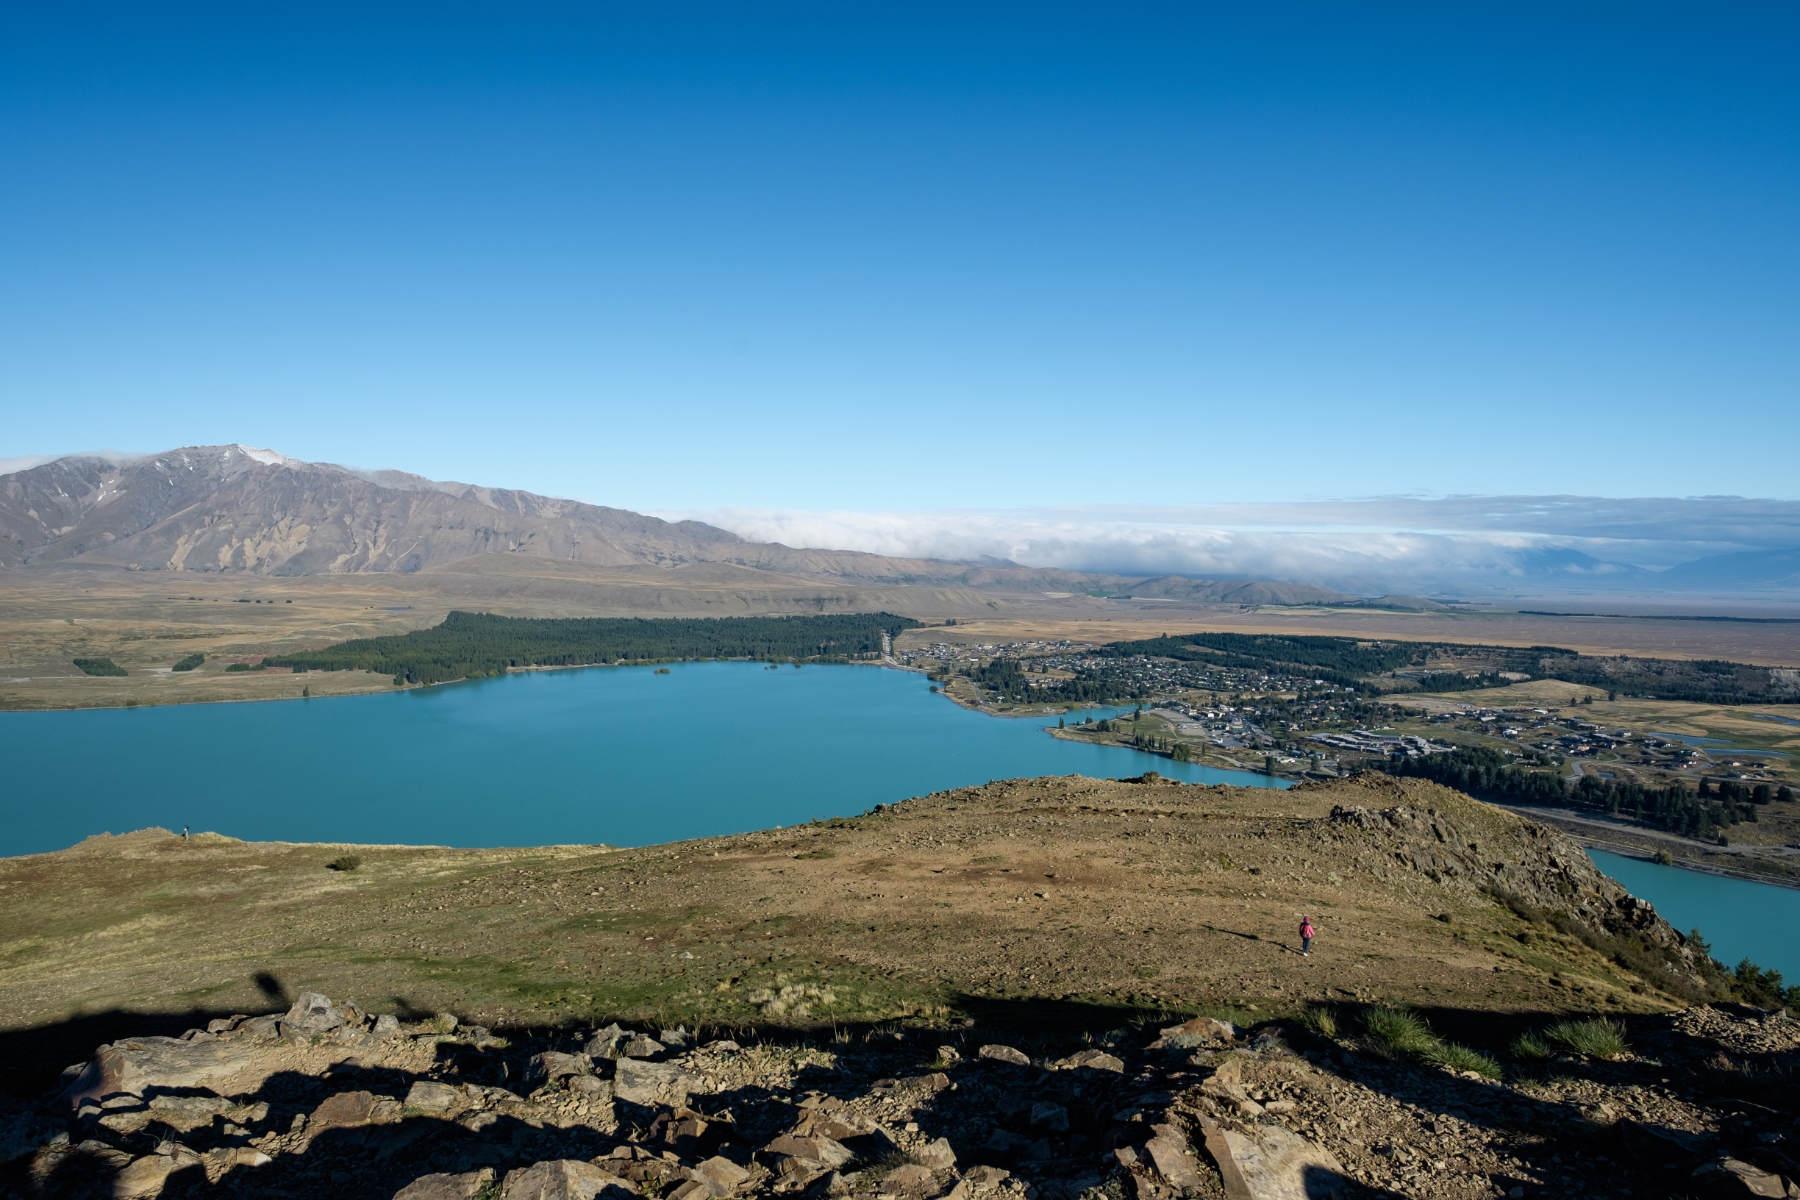 View of Lake Tekapo from Mount John new zealand